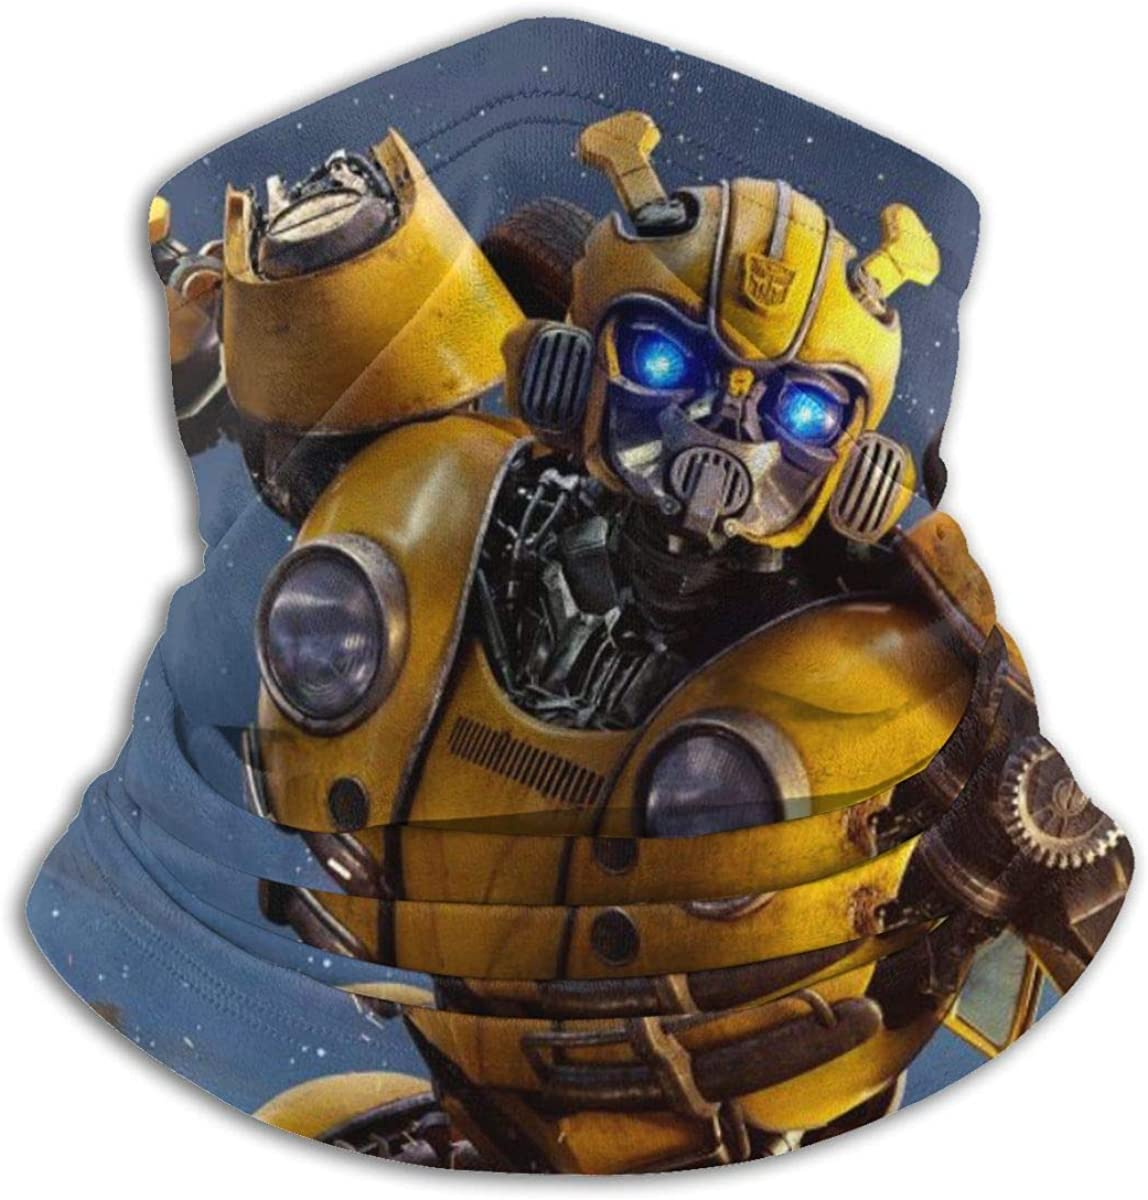 Transformers Bumblebee Neck Warmer Scarf Unisex Soft Windproof Novelty Headband For Sports Hiking